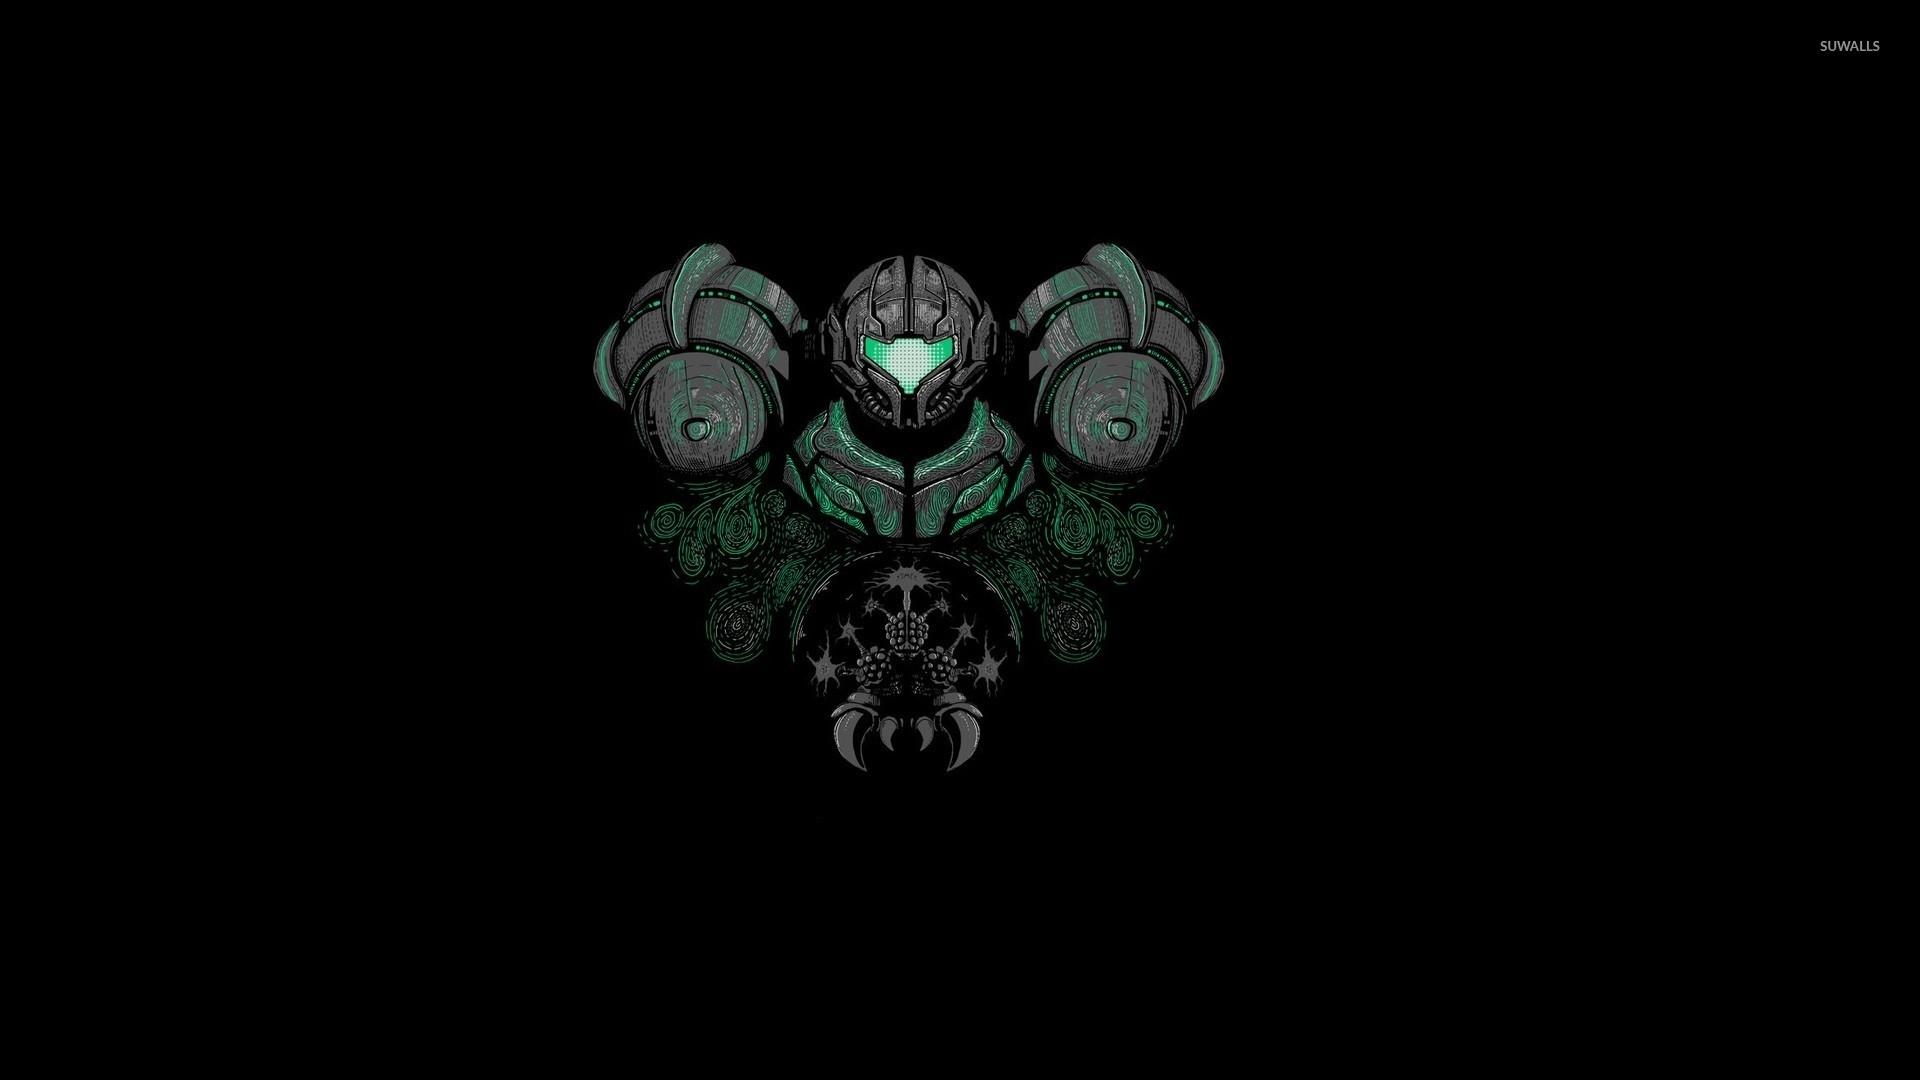 Metroid Prime [3] wallpaper jpg